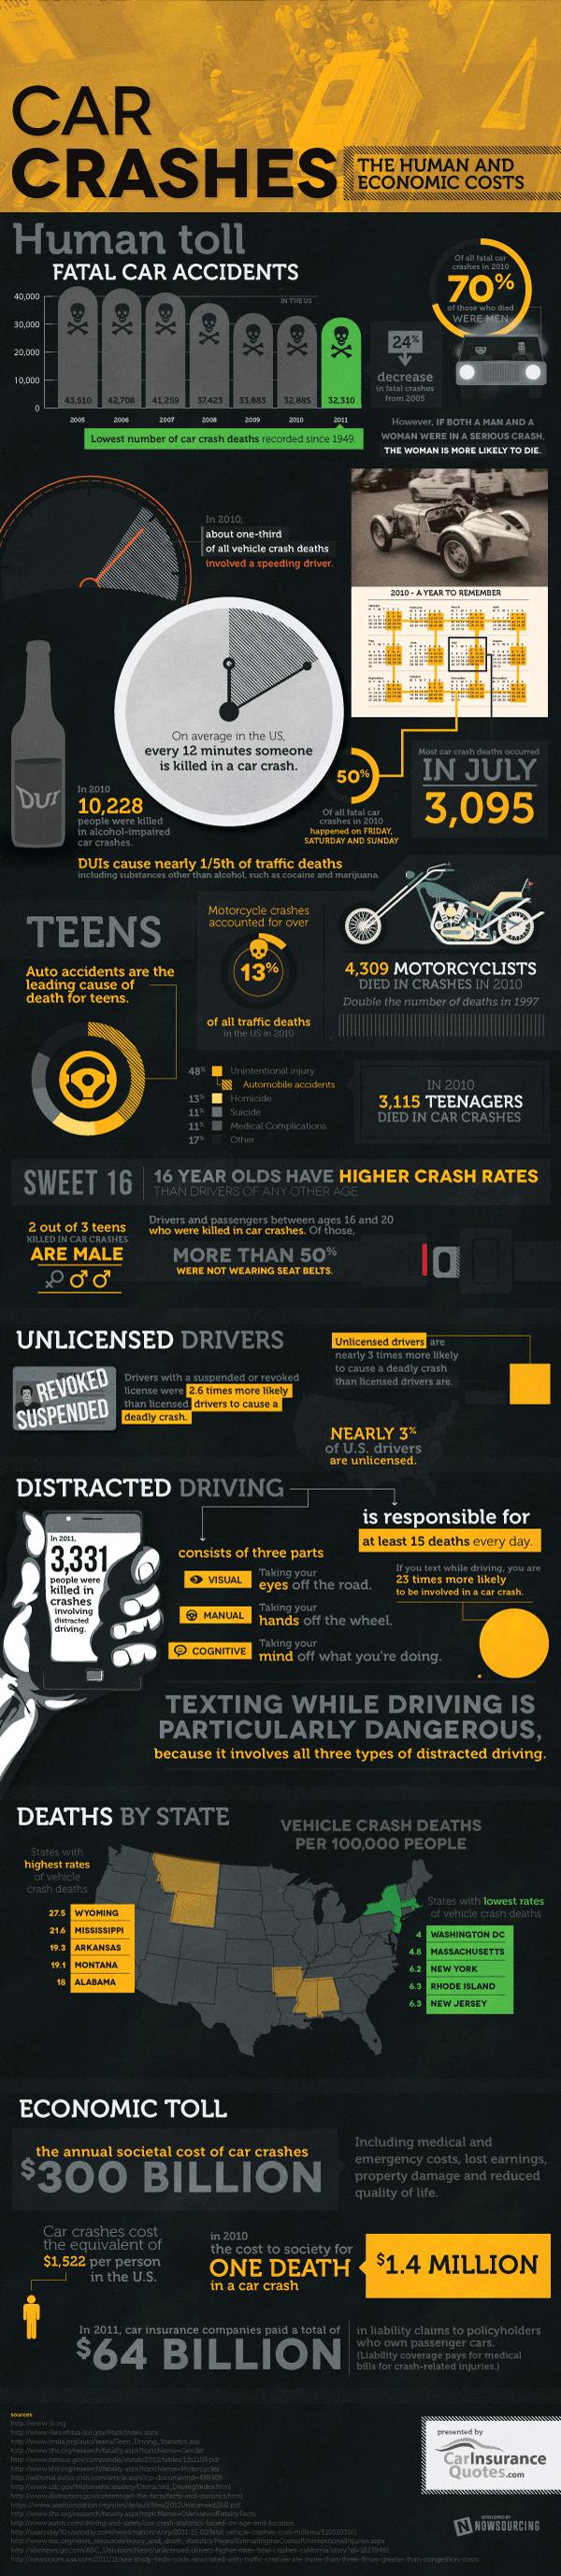 US Car Crash Statistics 2011-Infographic